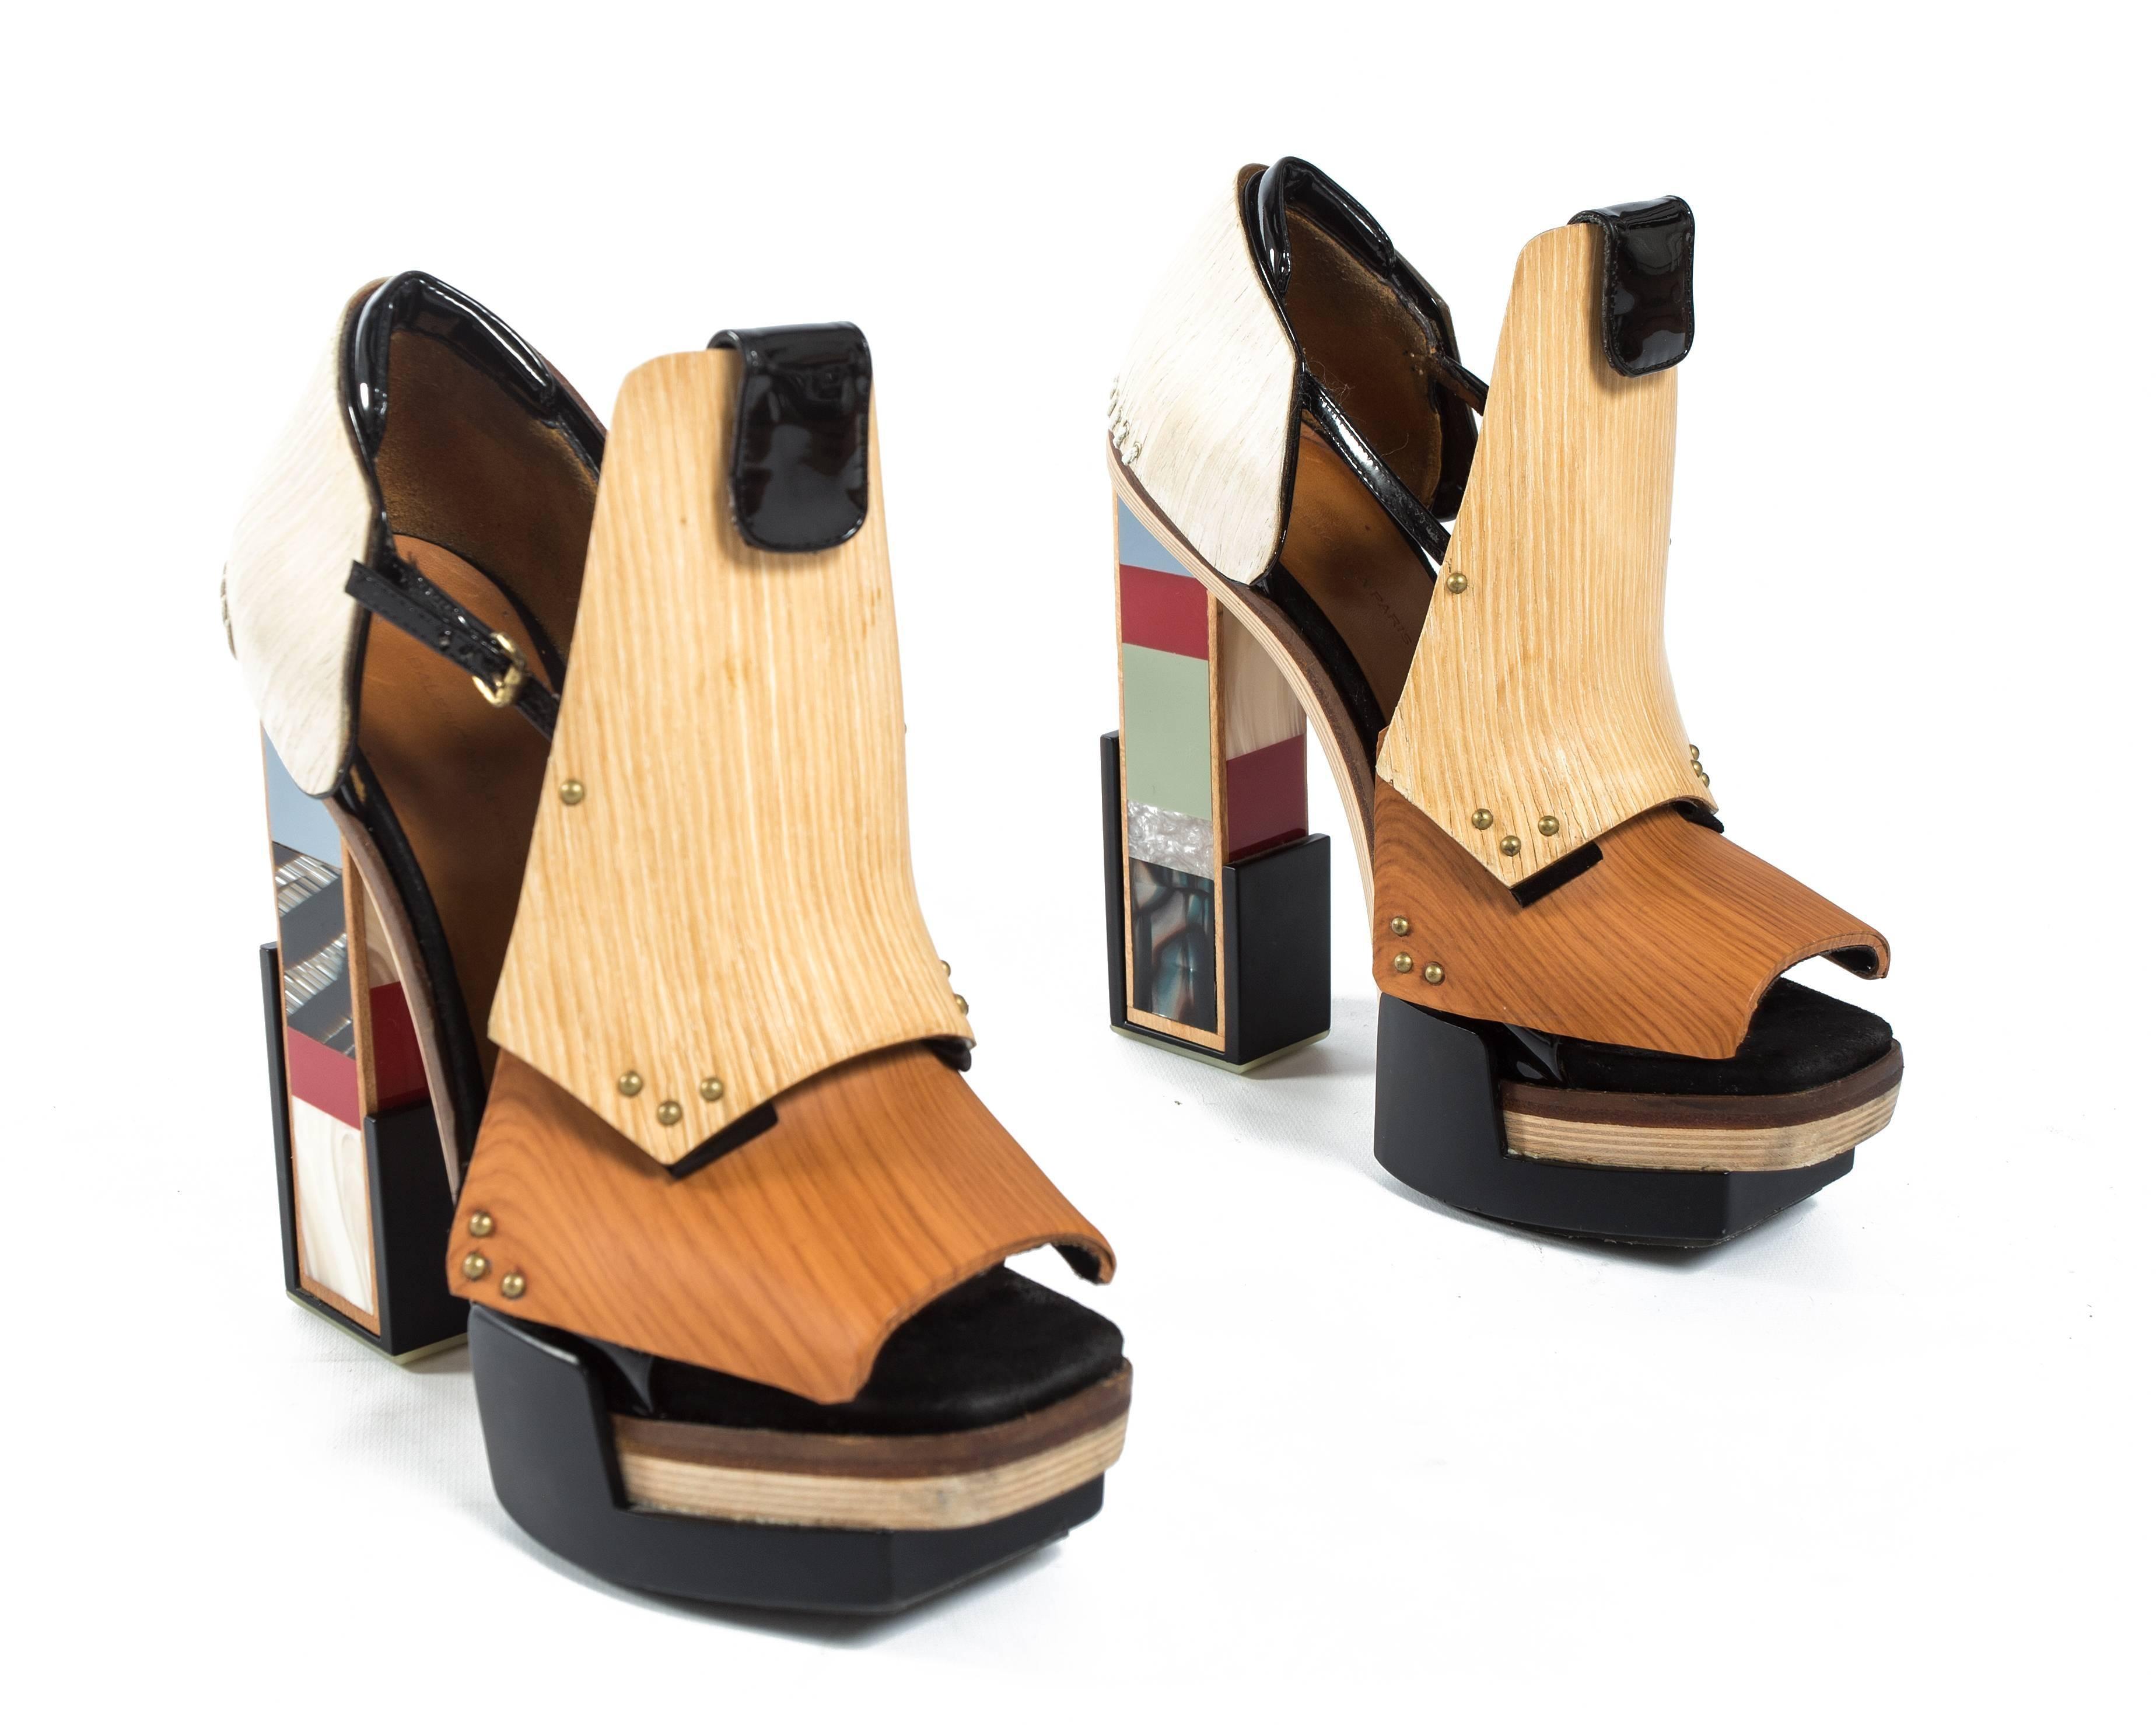 db56b44eaf6 Balenciaga by Nicolas Ghesquière mixed media wooden block heels